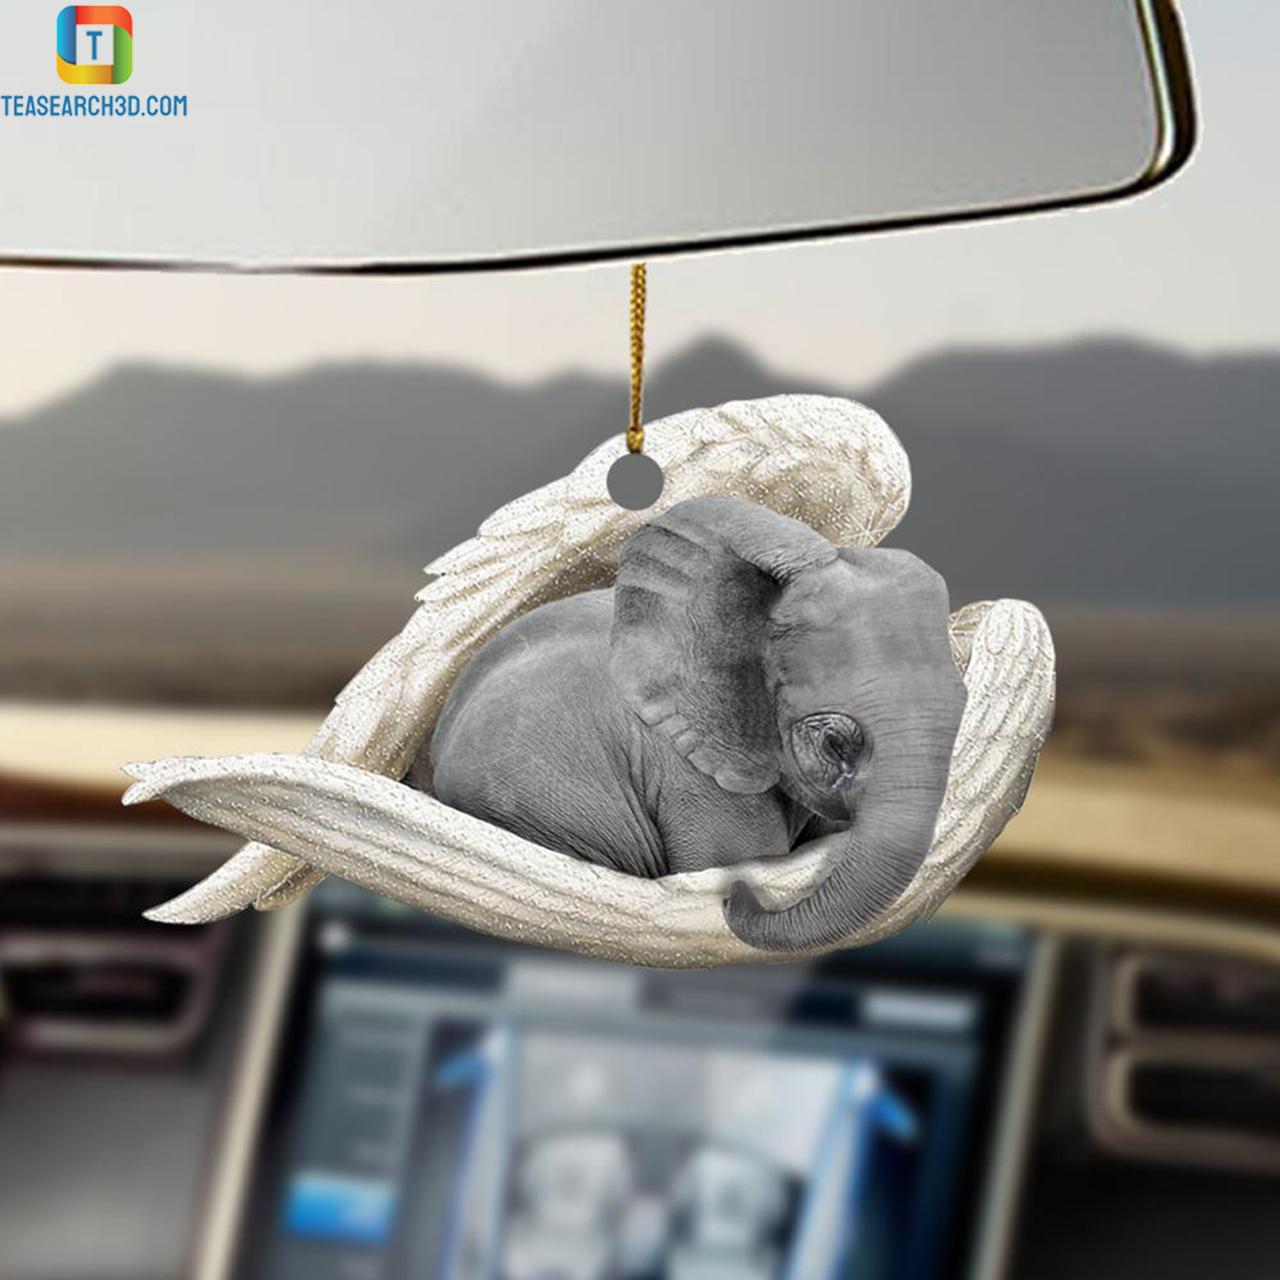 Elephant sleeping angel car hanging ornament 1